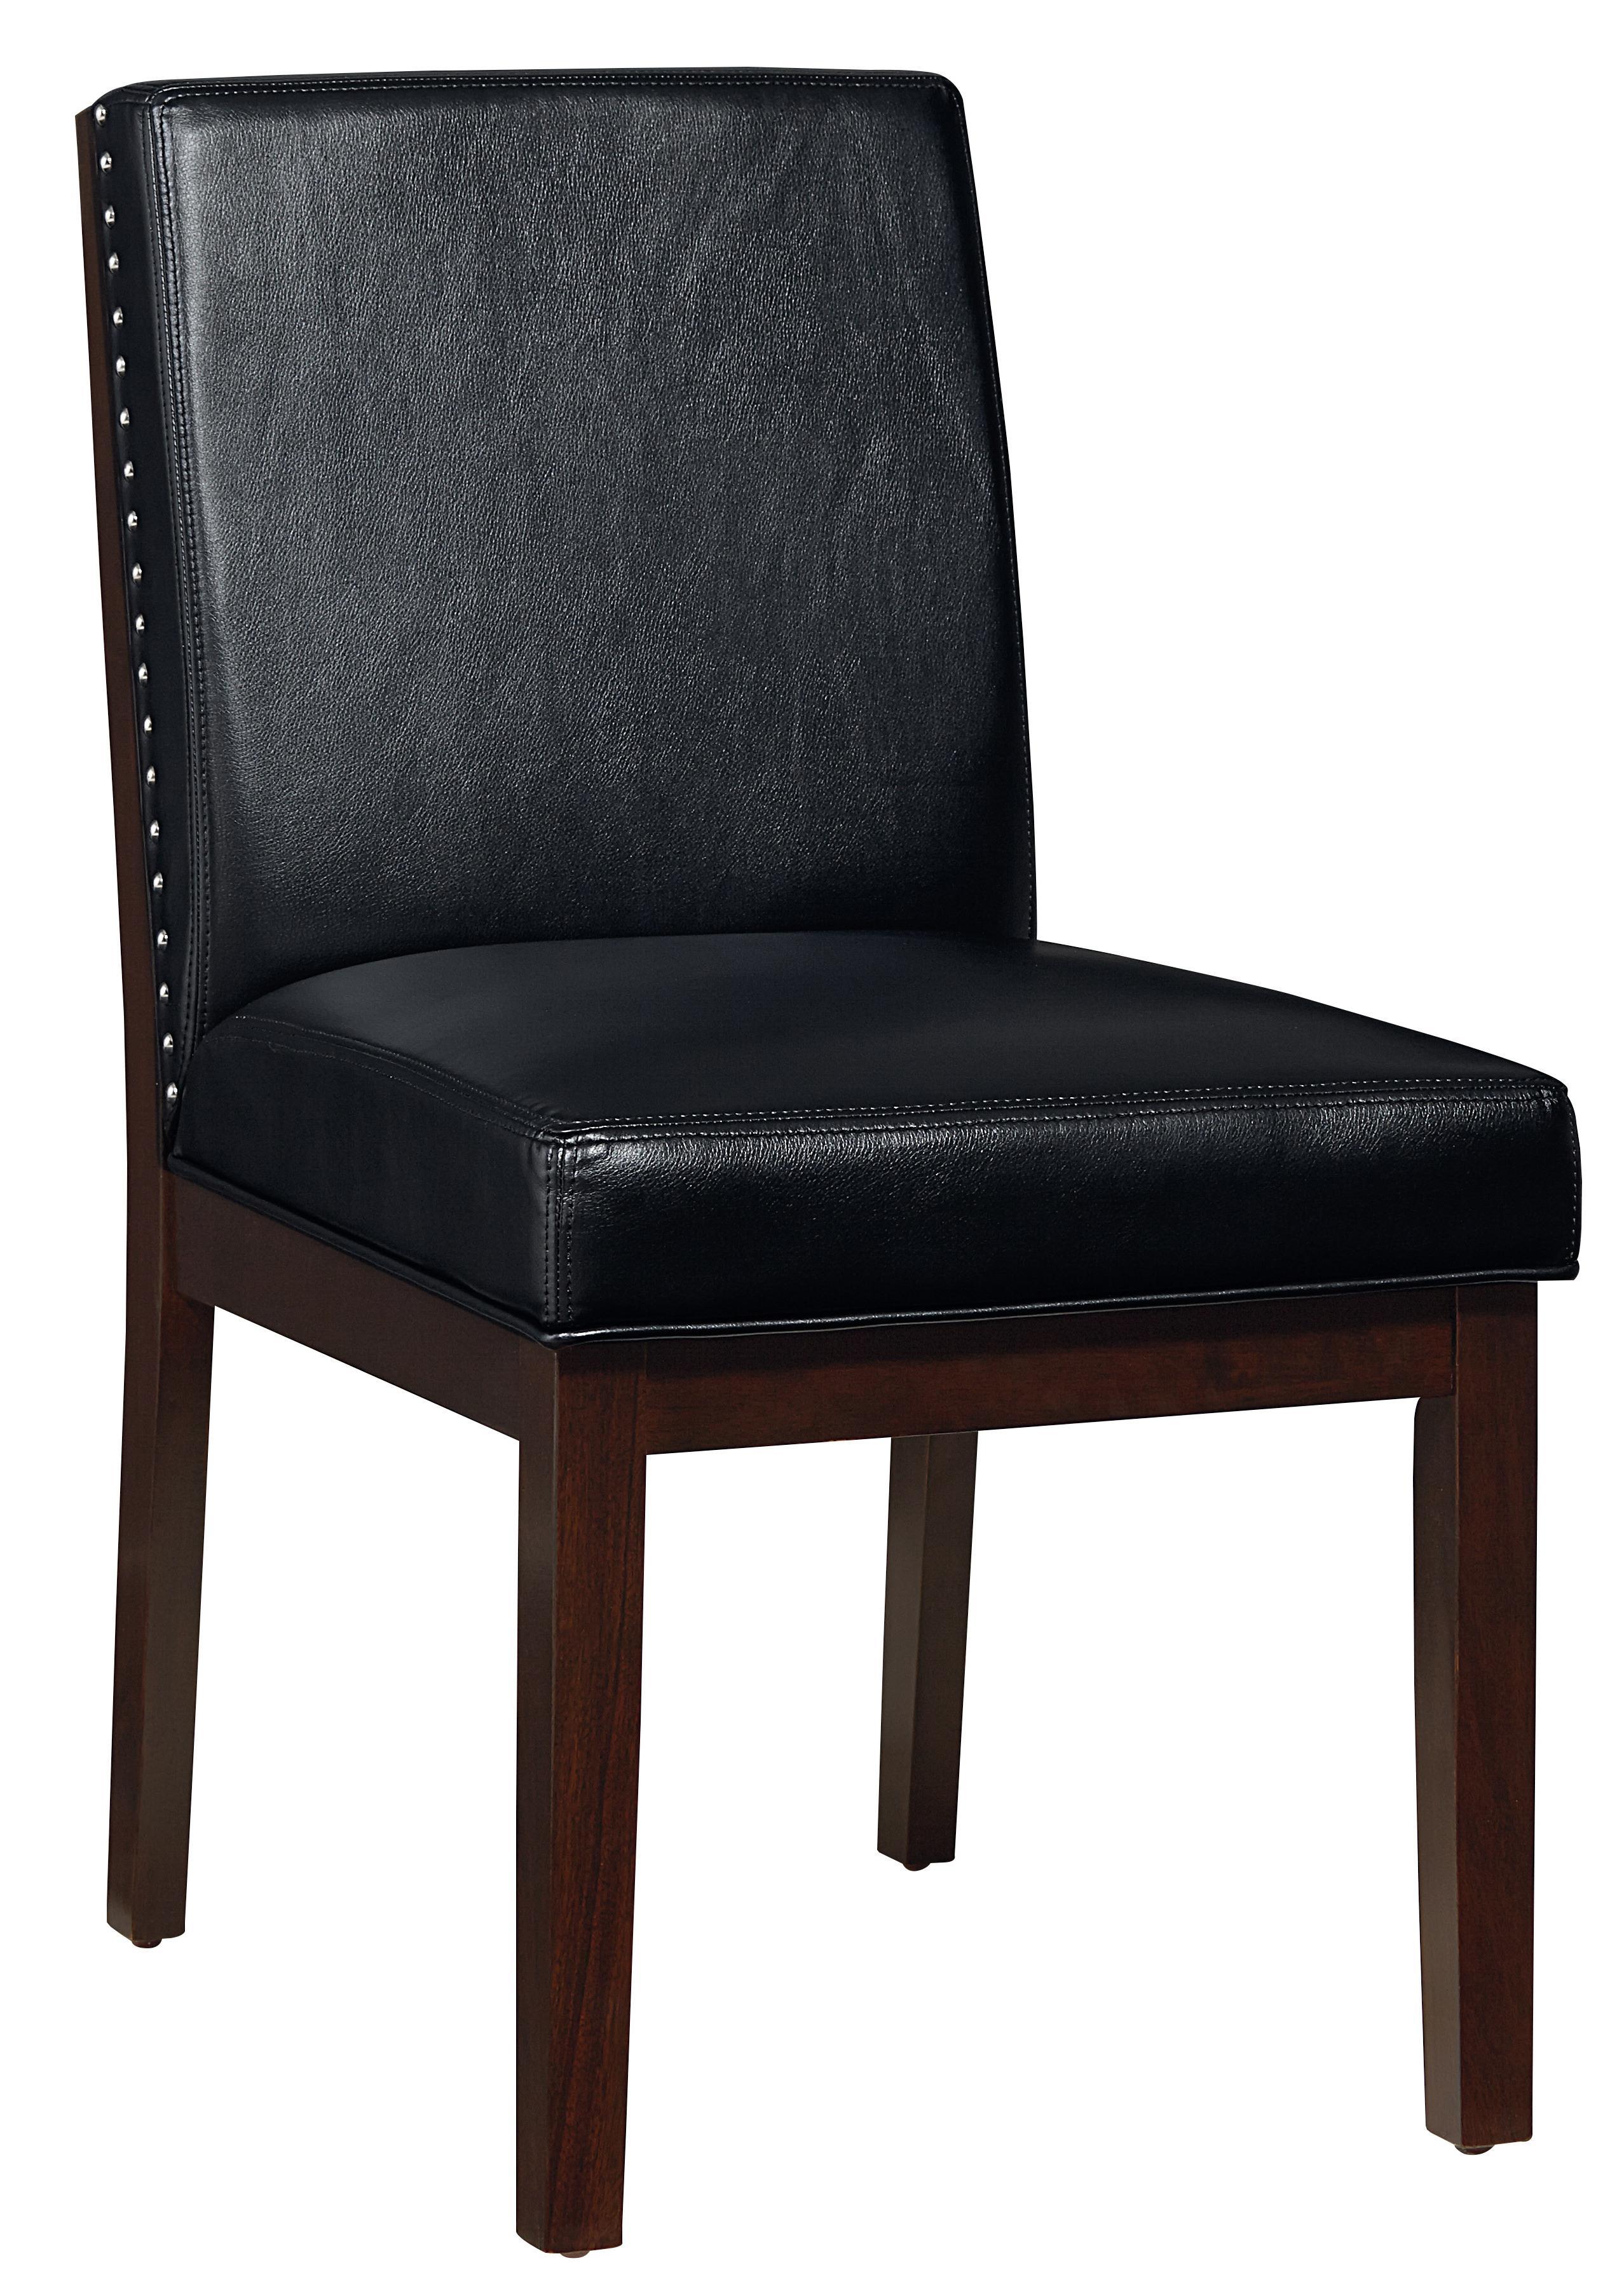 Standard Furniture Couture Elegance Upholstered Side Chair - Item Number: 10567